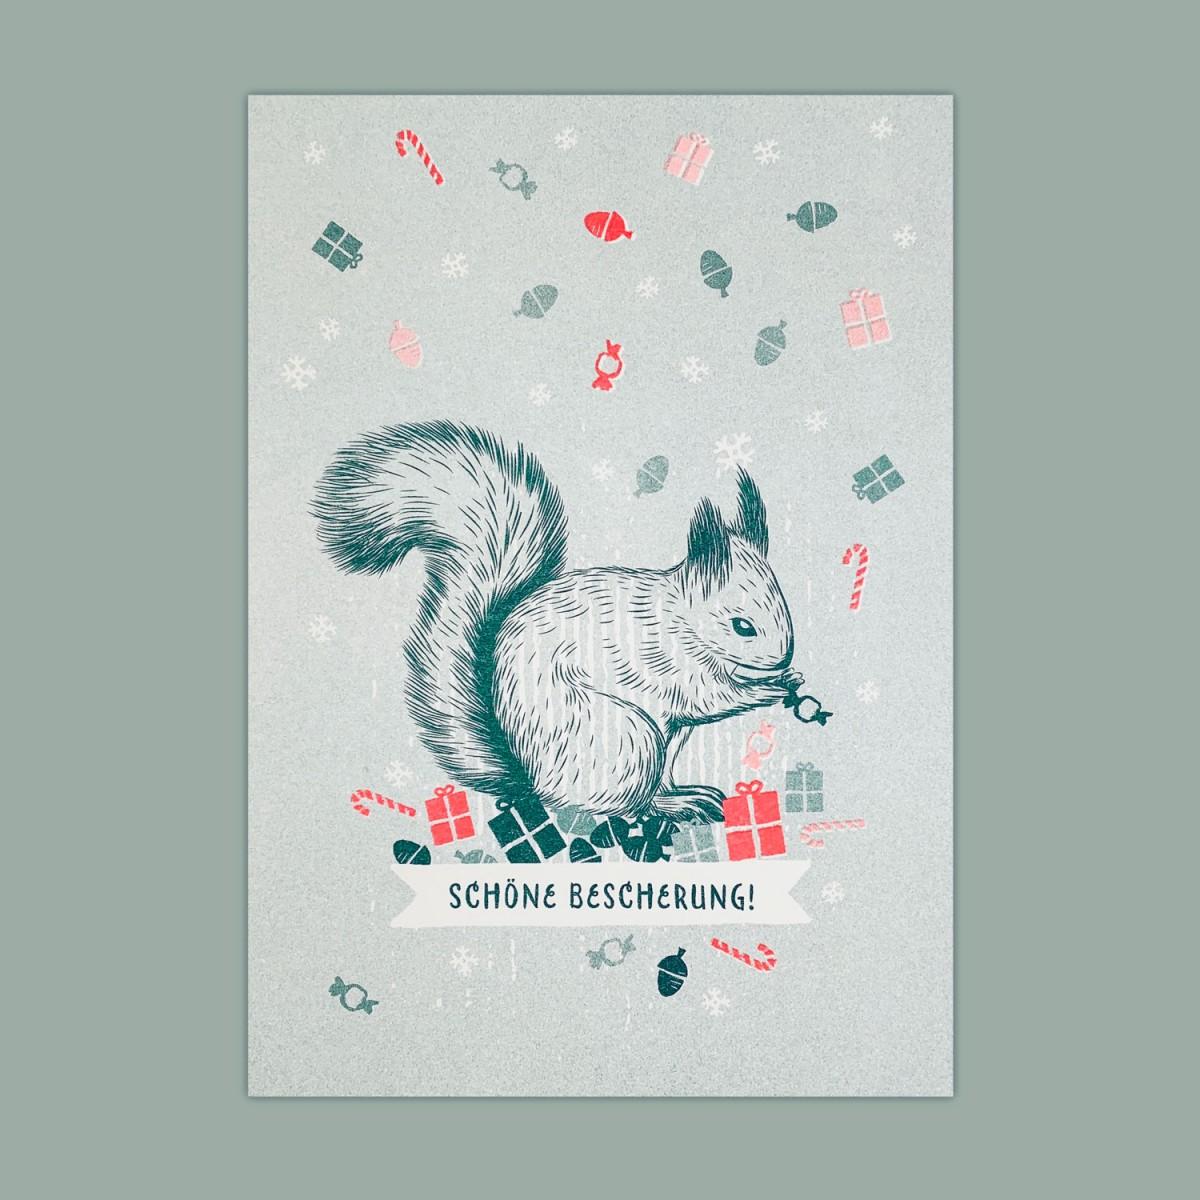 Feingeladen // LOVELY BEASTS // Squirrel »Schöne Bescherung!« (TLFR), RISO-Kunstdruck, A5